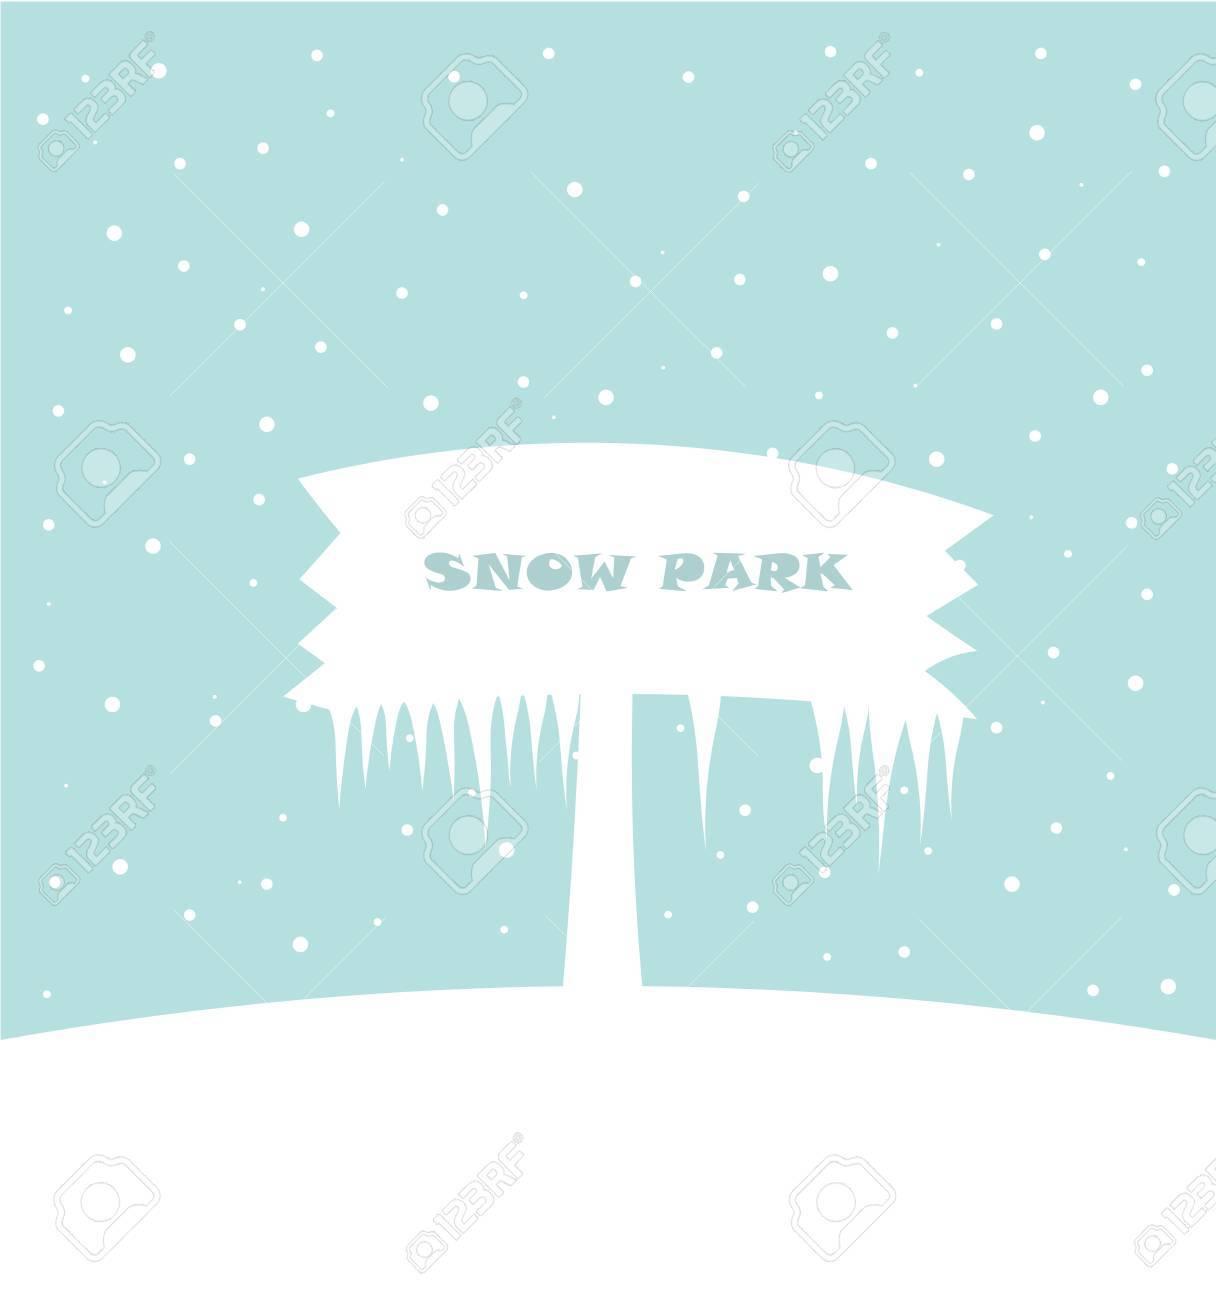 Snow park - white board in snowy landscape. Stock Vector - 17519720